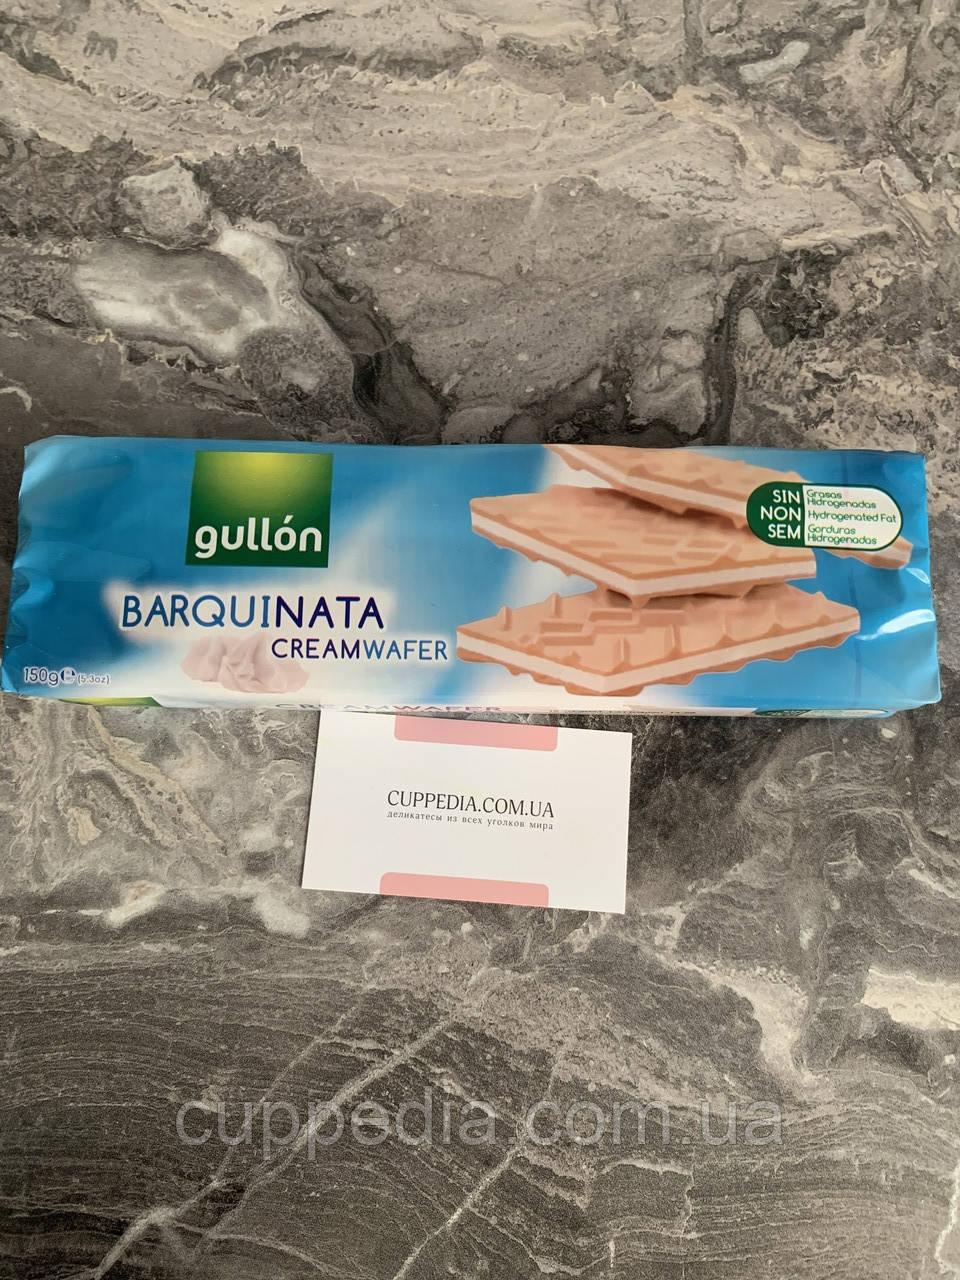 Вафлі Gullon Barquinata creamwafer 150 грм